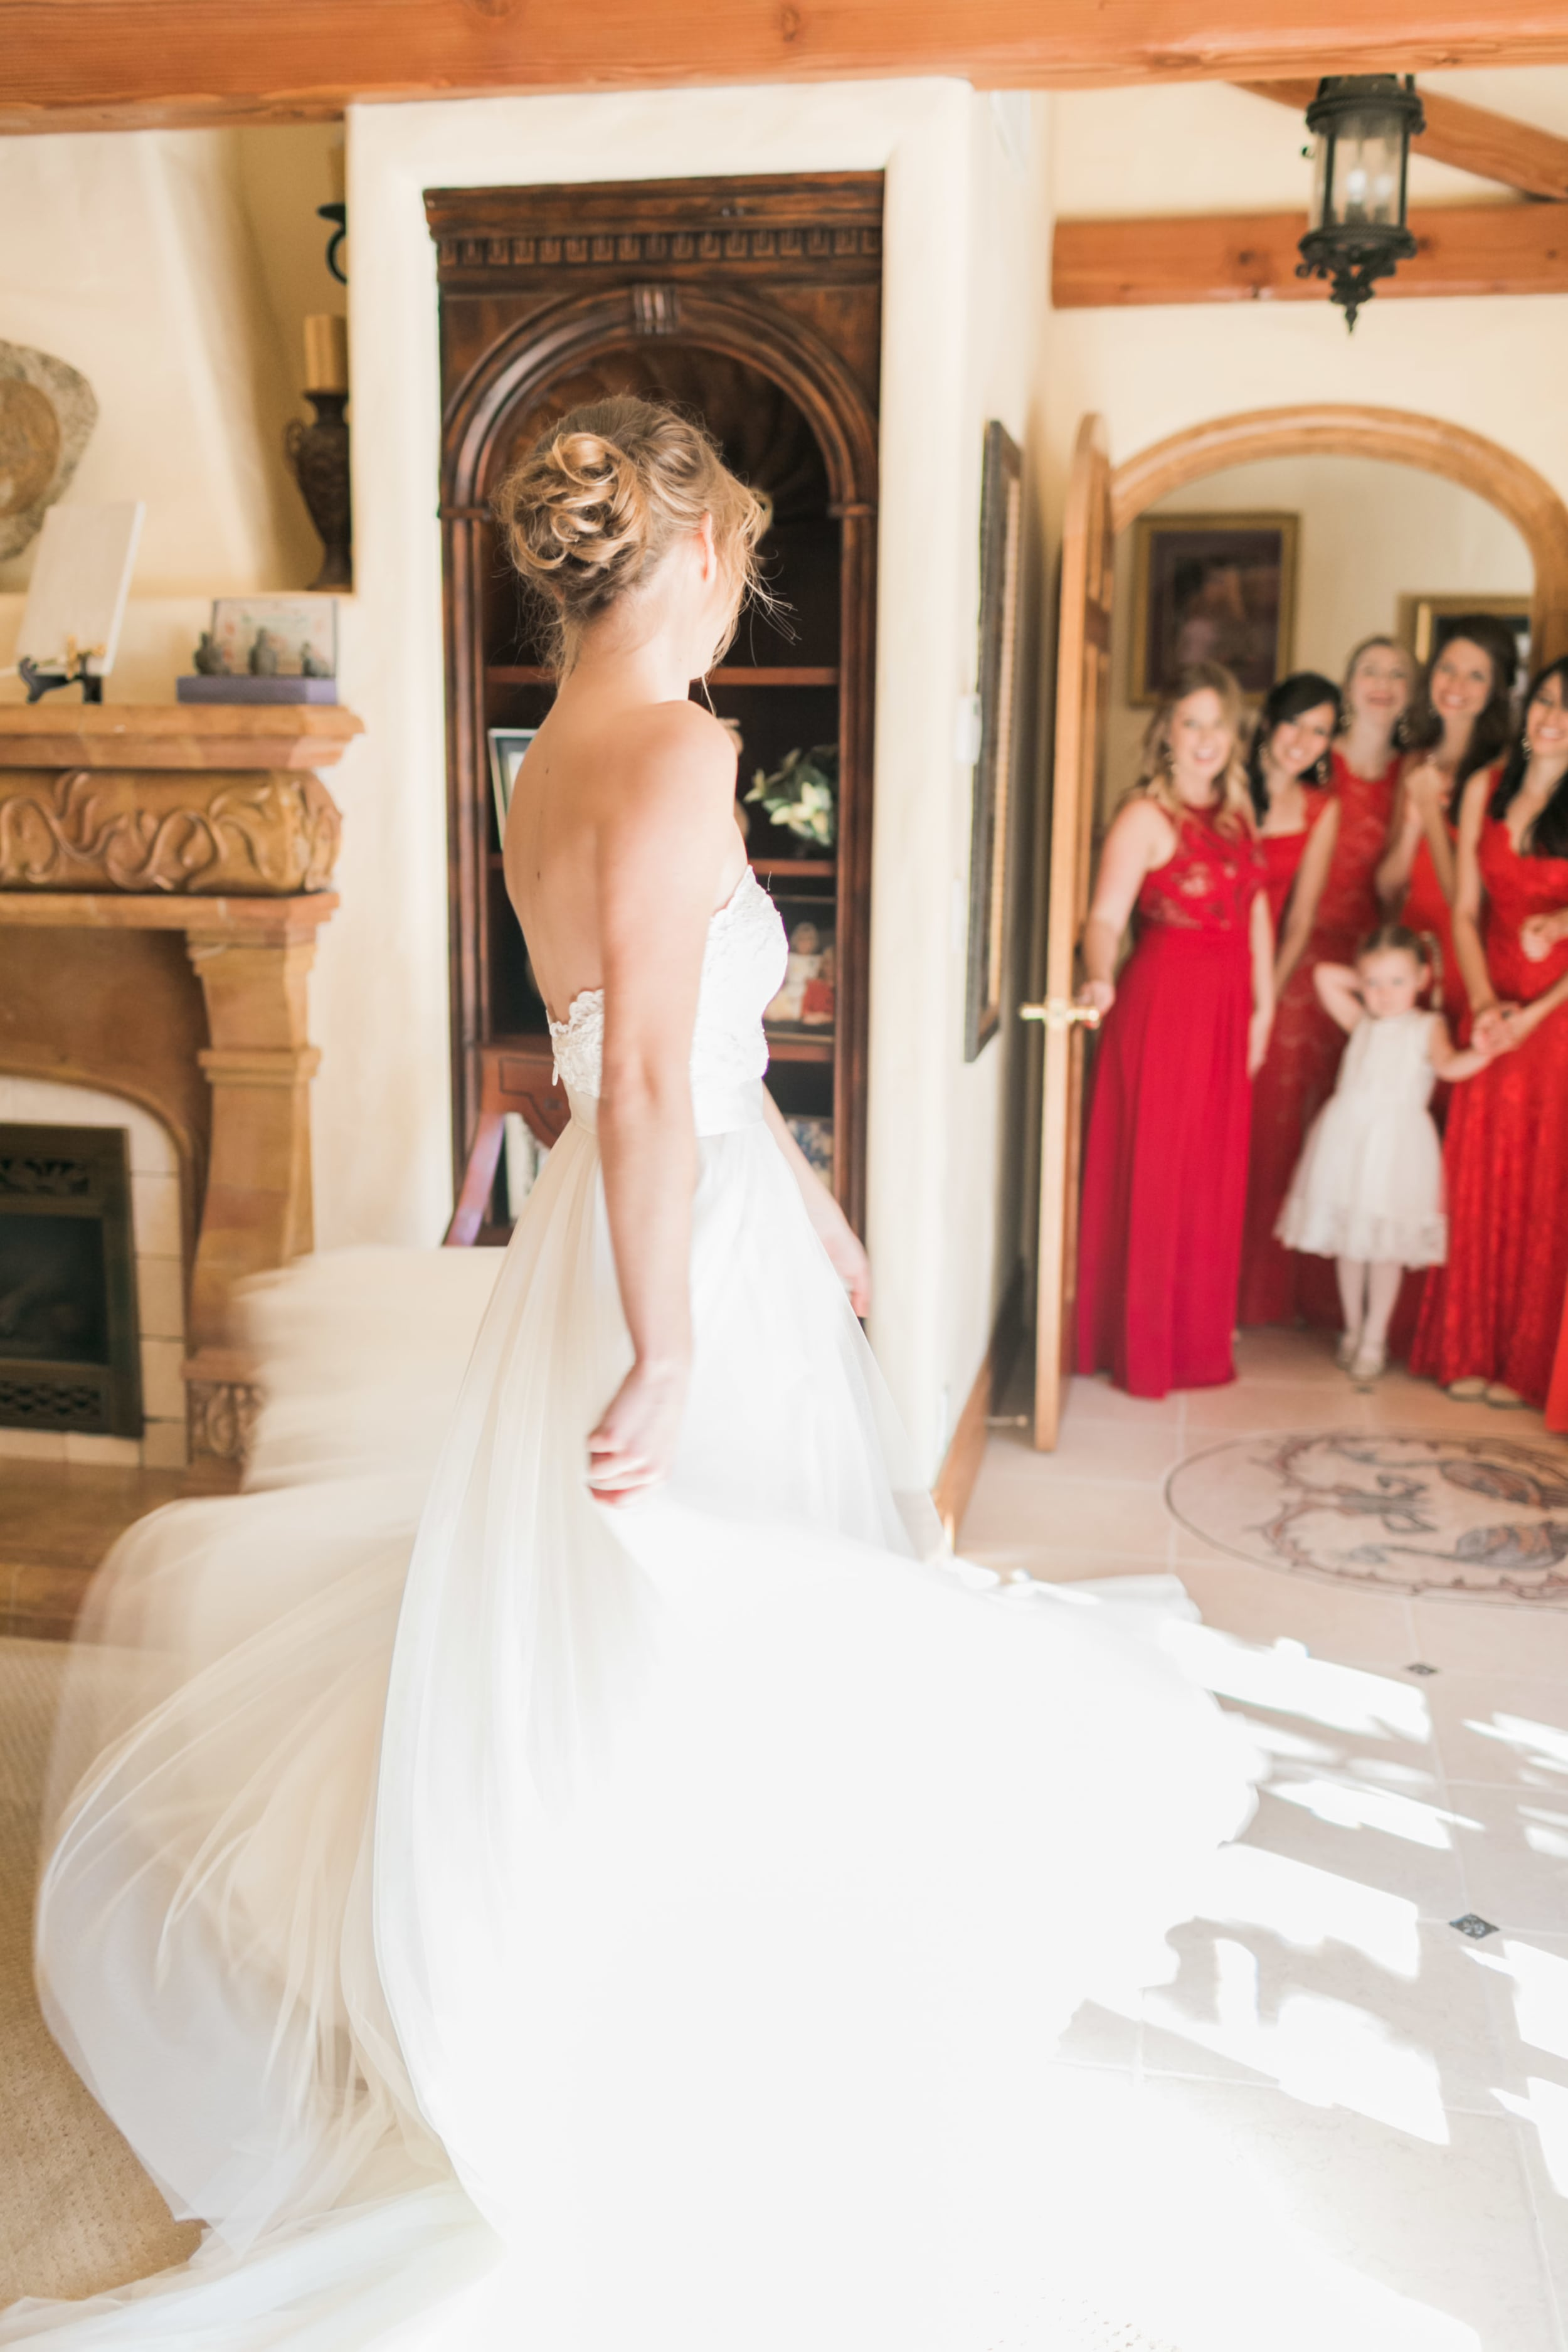 Natalie_Schutt_Photography_Winter_Wedding_San_Luis_Obispo-39.jpg